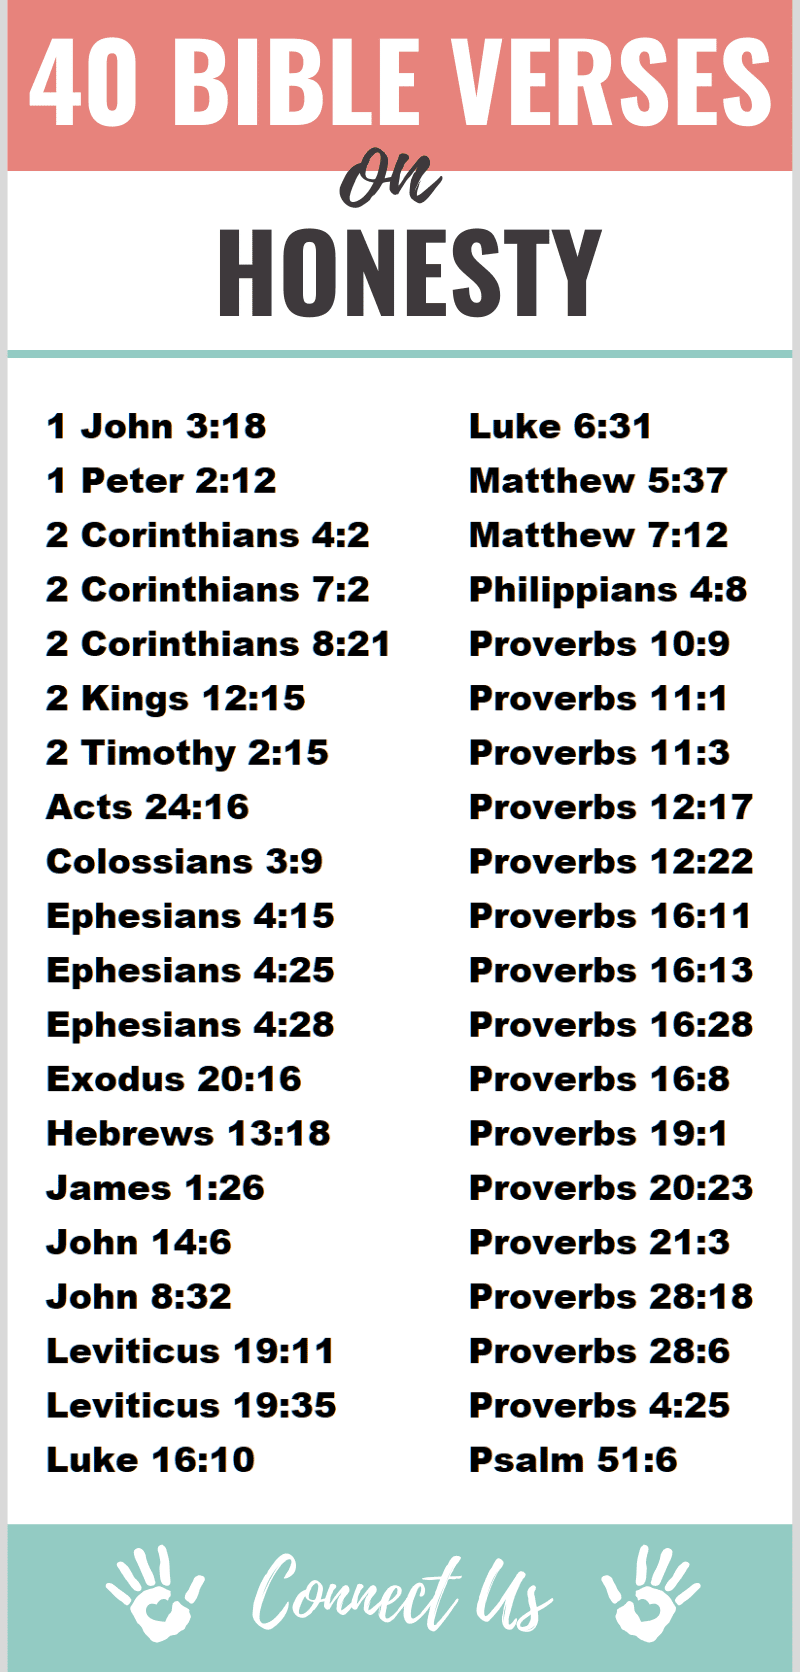 Bible Verses on Honesty